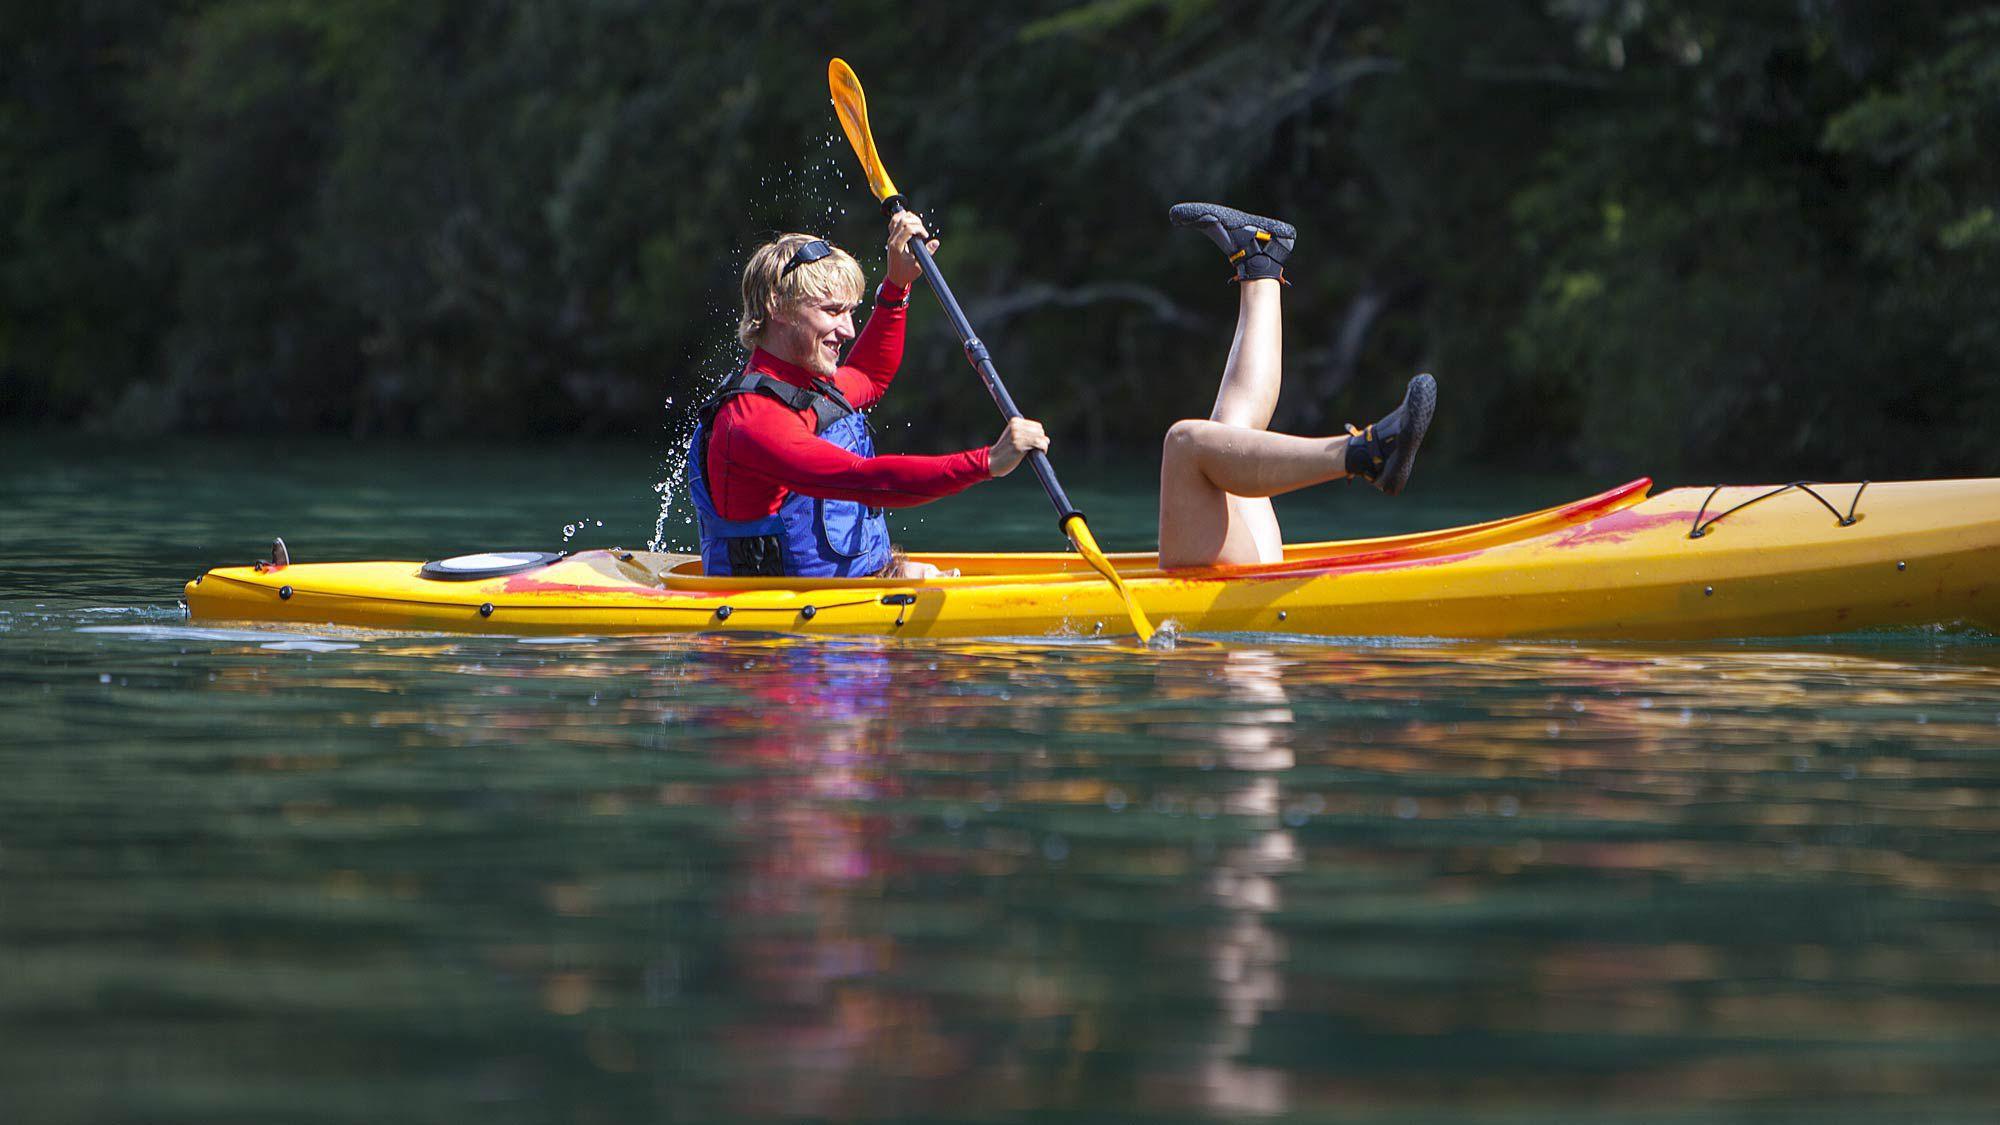 Resultado de imagen para Kayaks Rígidos que son